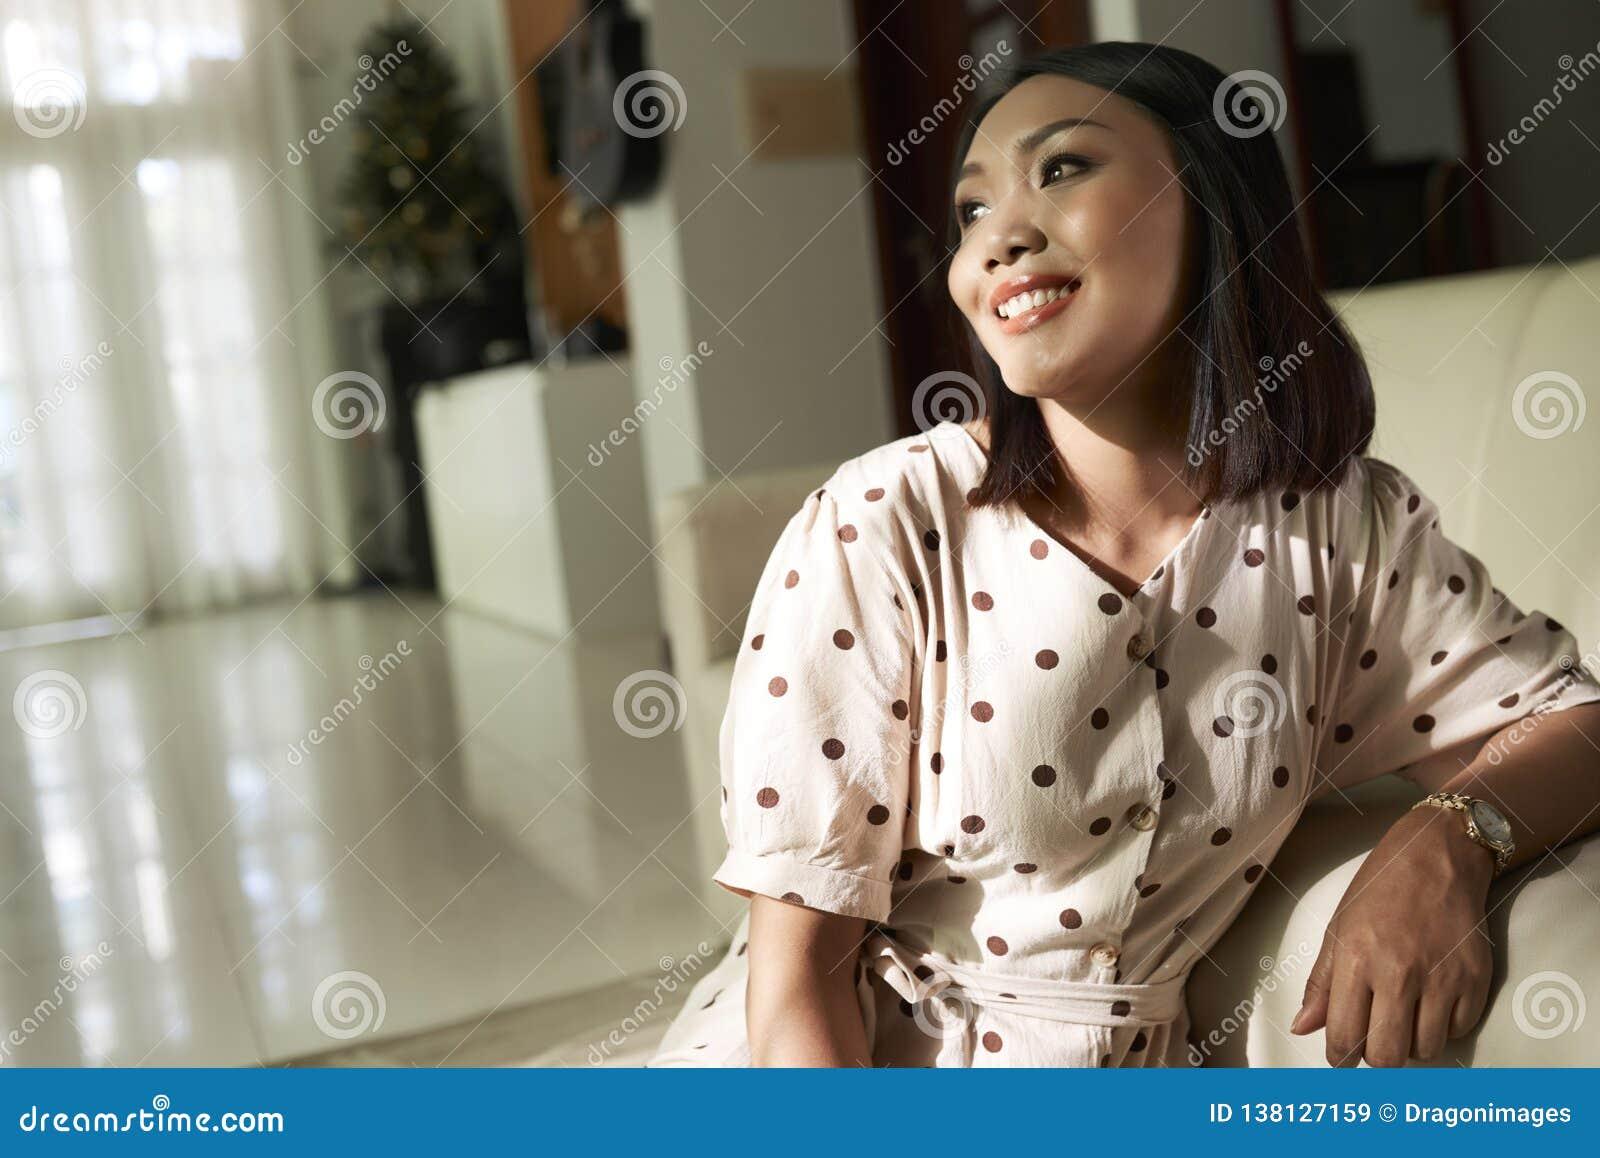 Ursnygg le ung kvinna